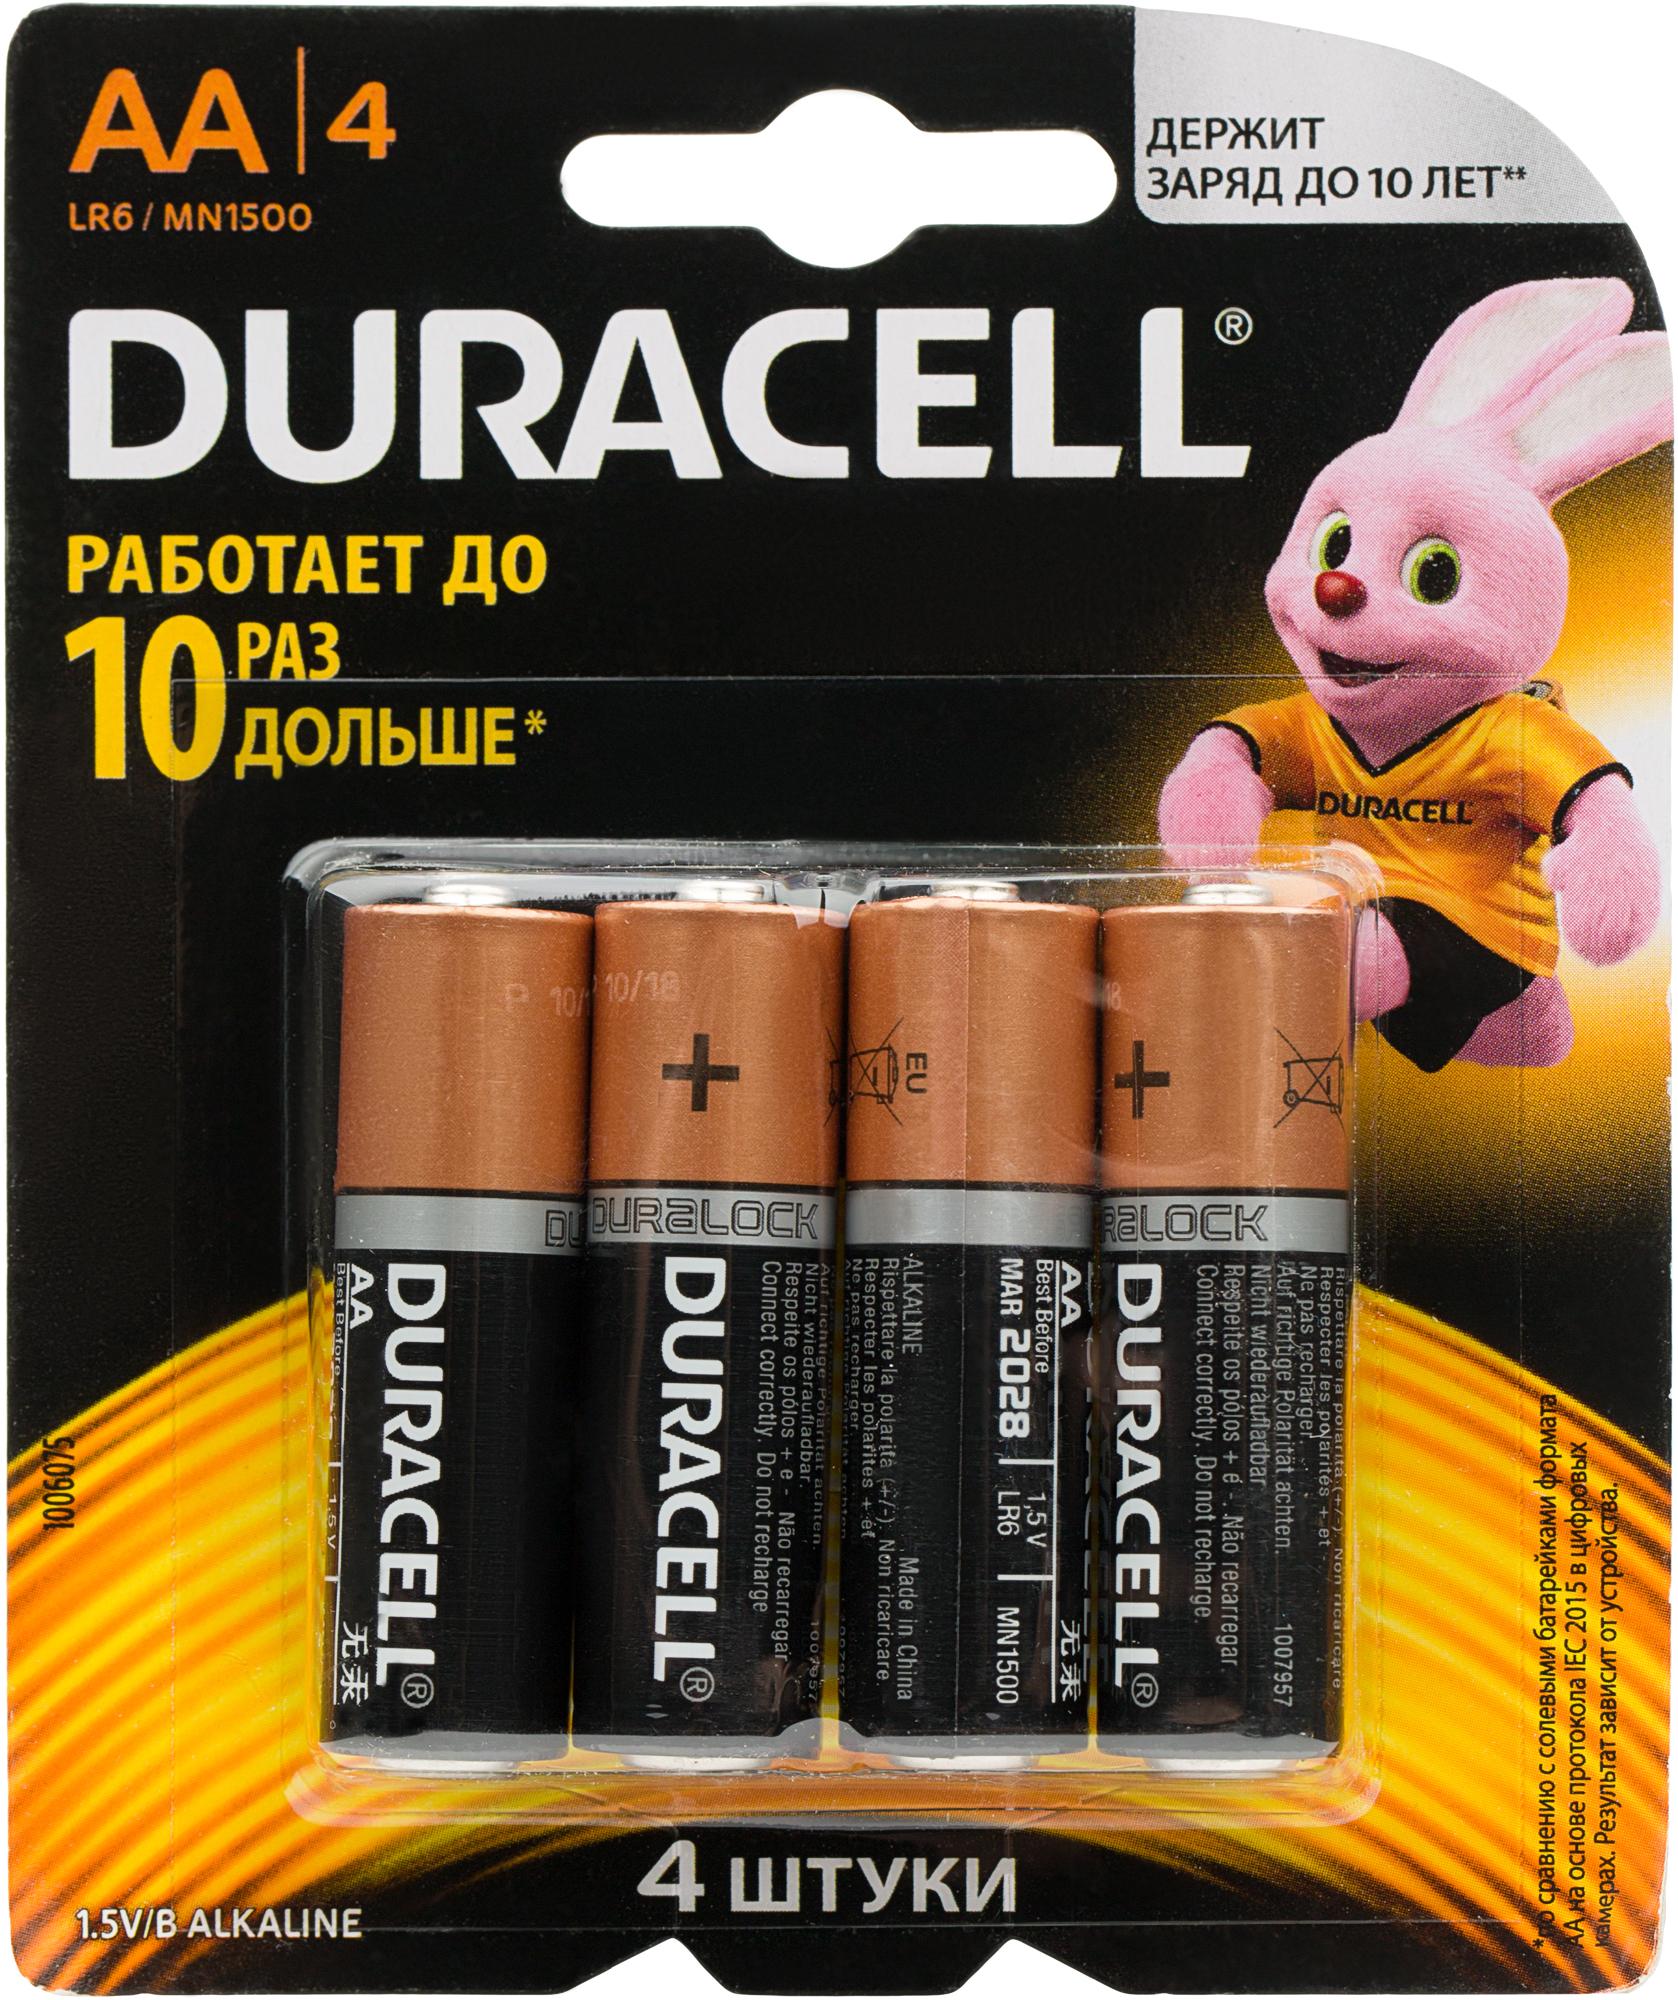 Duracell Батарейки щелочные BASIC CN АА/LR6, 4 шт.